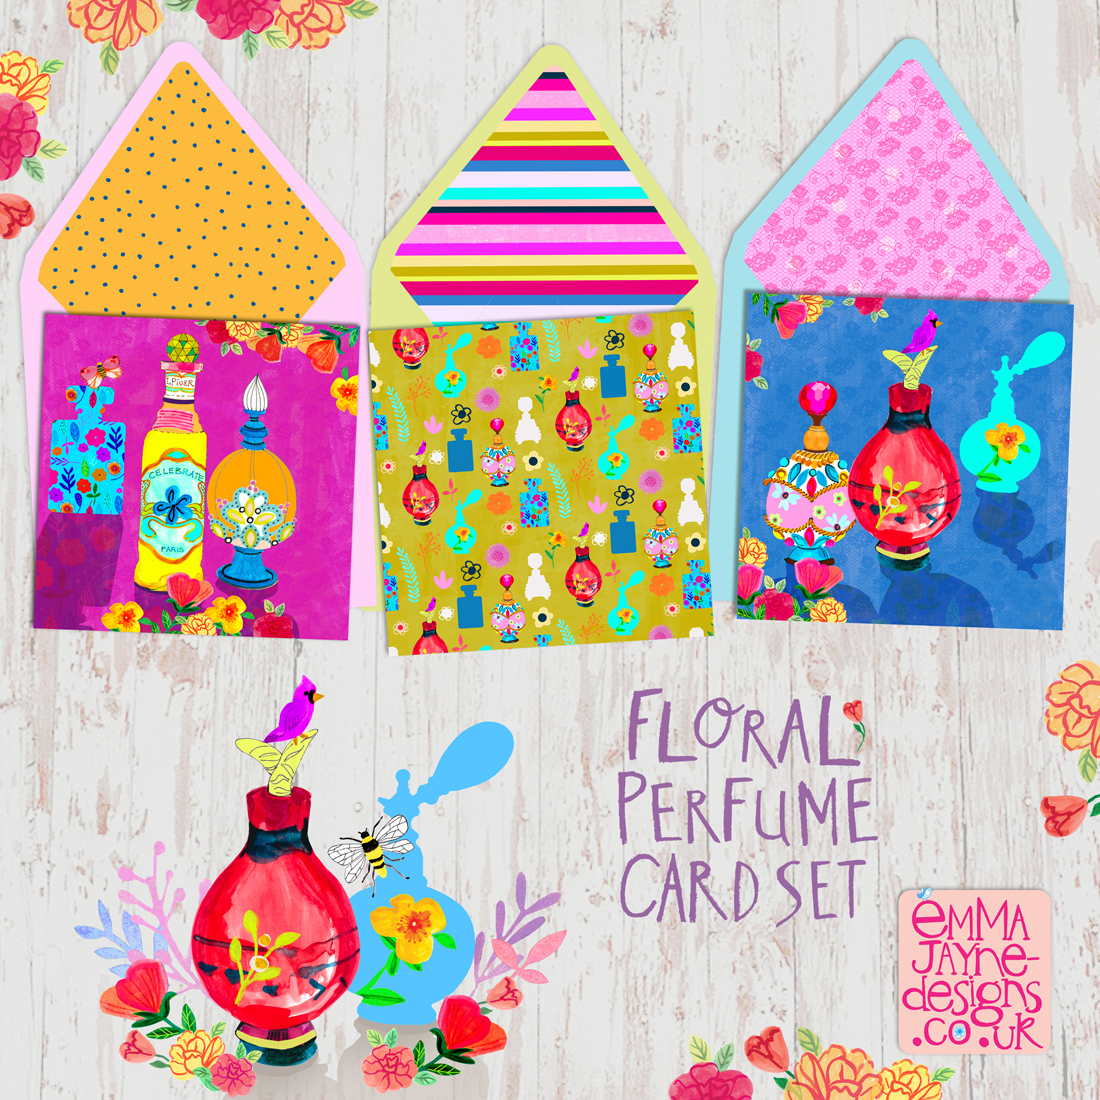 Colourful-floral-perfume-card-set-emmajayne-designs